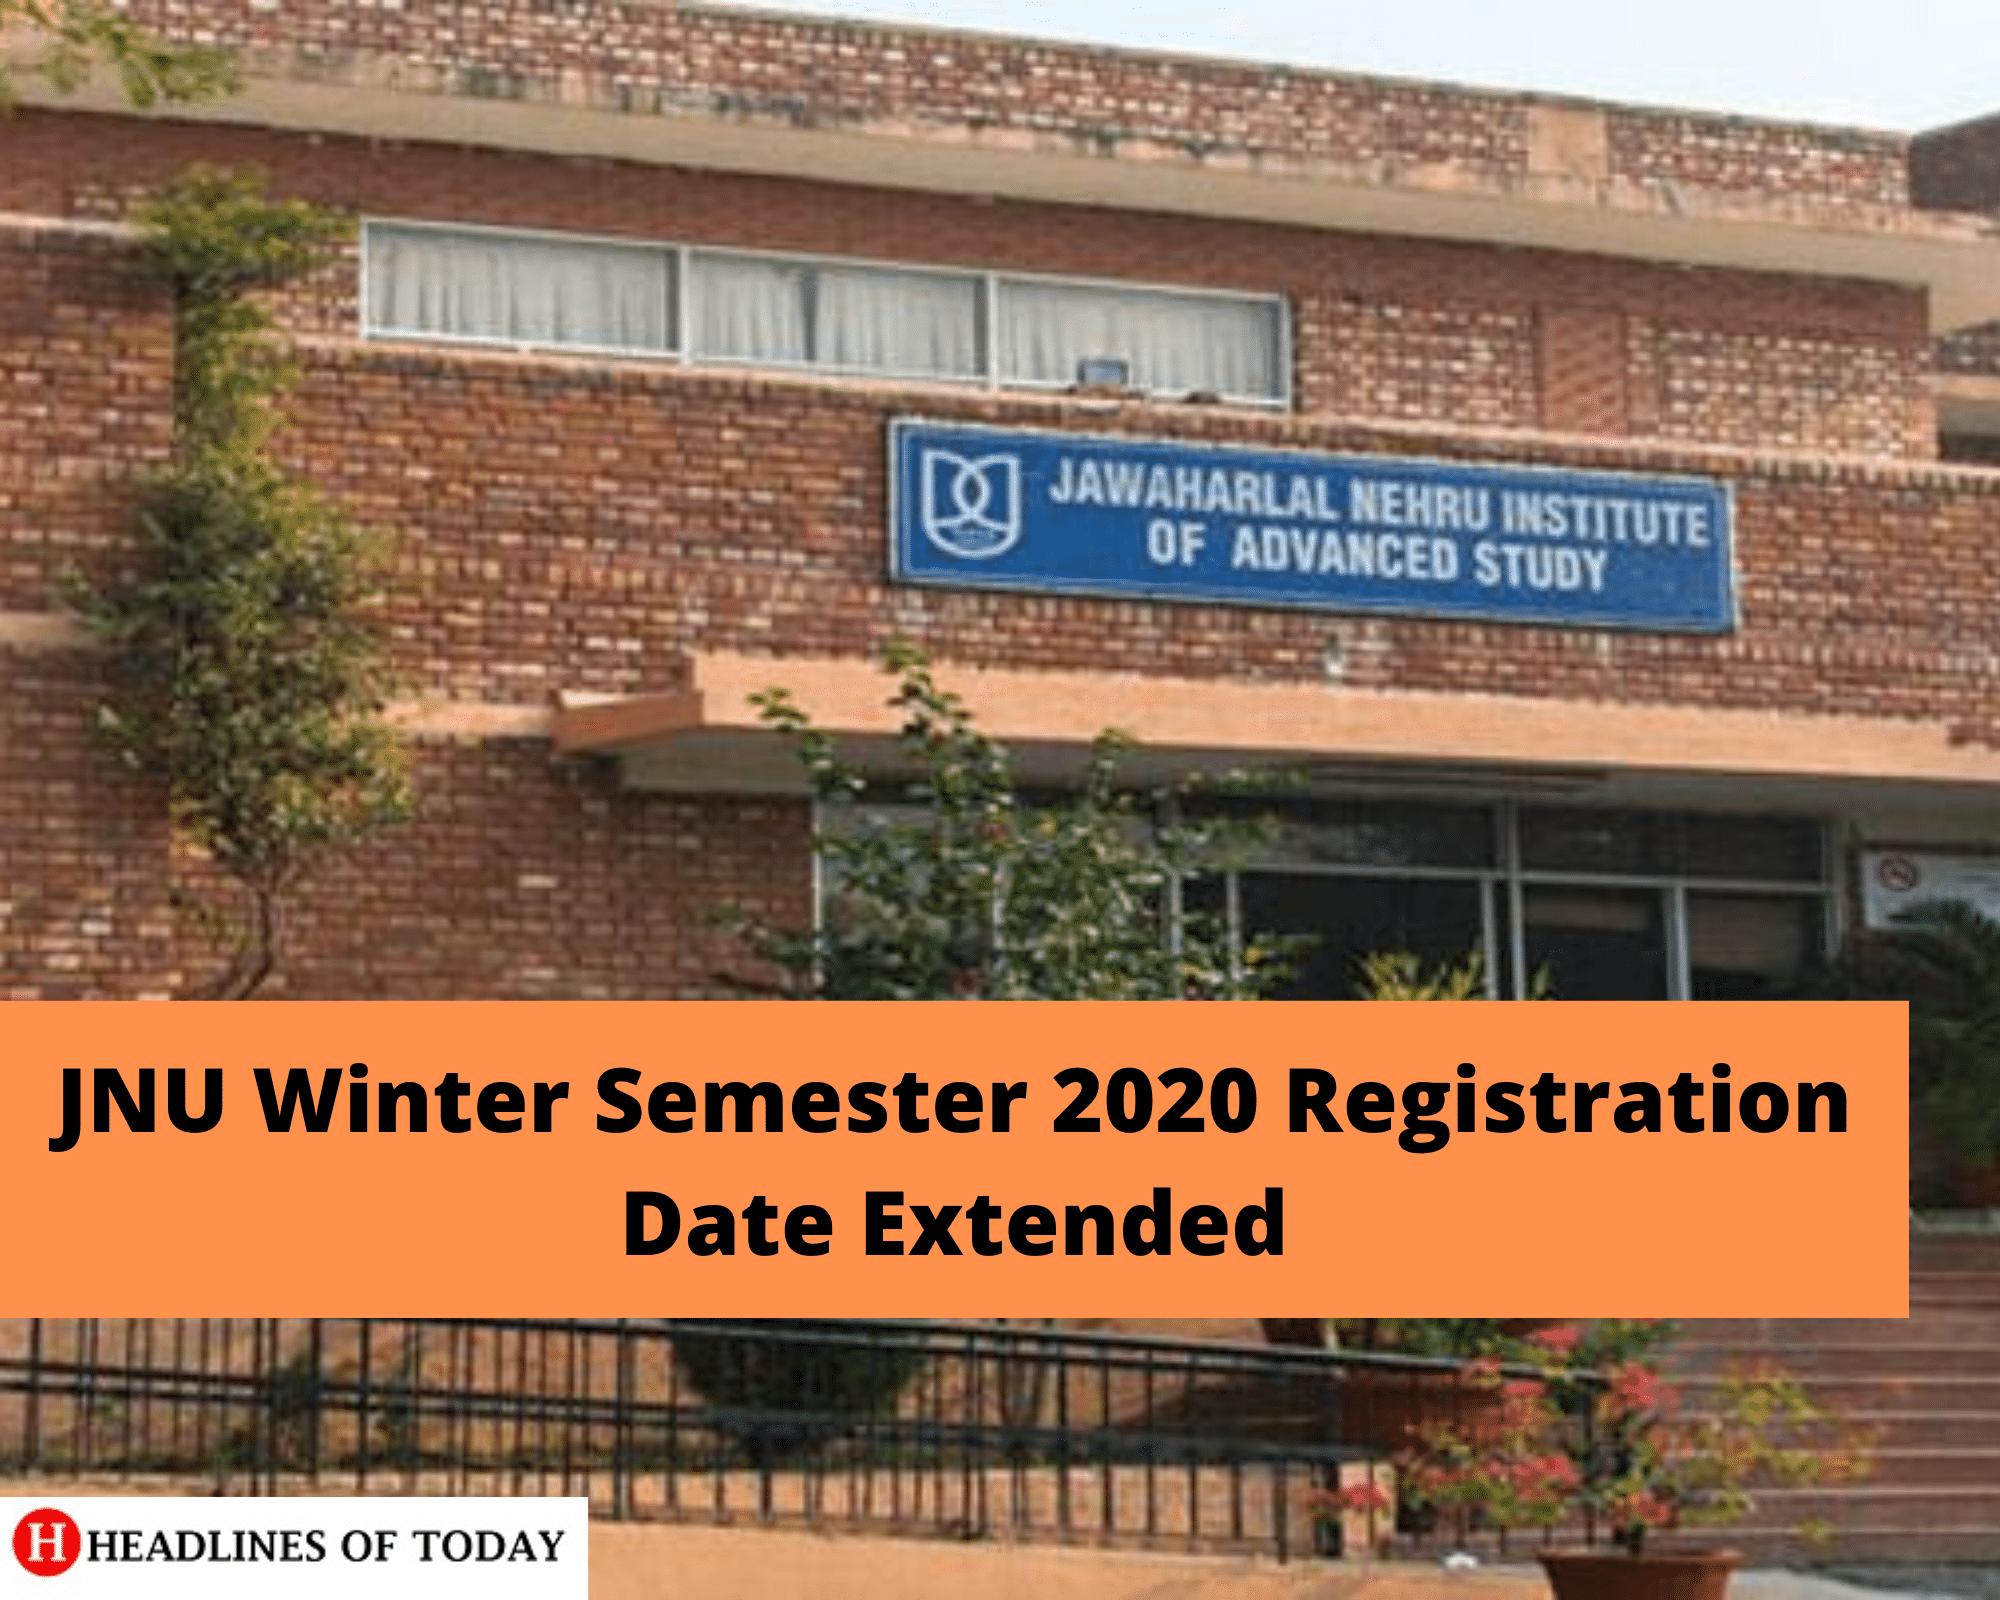 JNU Winter Semester 2020